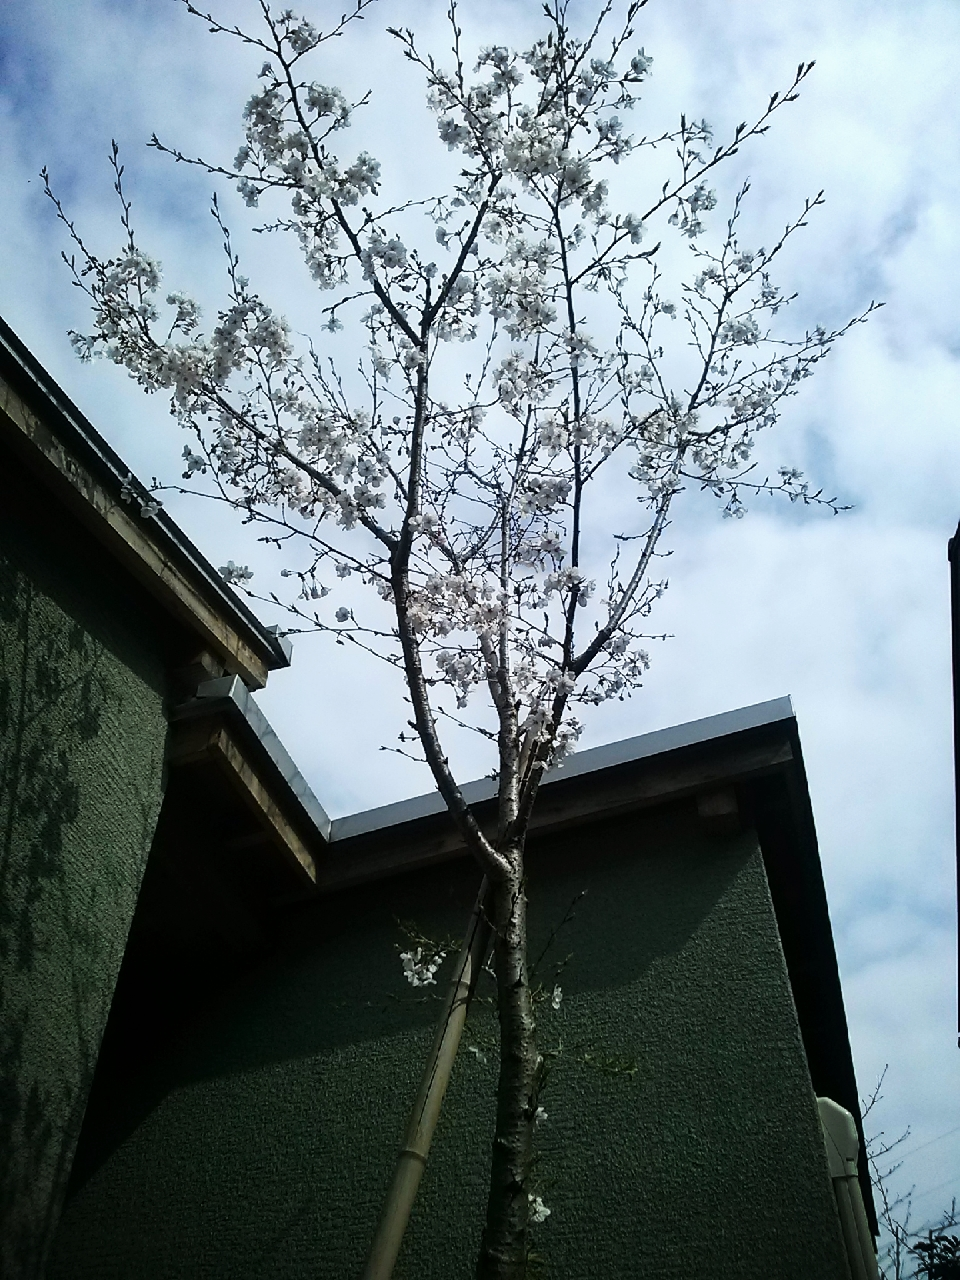 16-04-03-14-59-51-372_deco.jpg